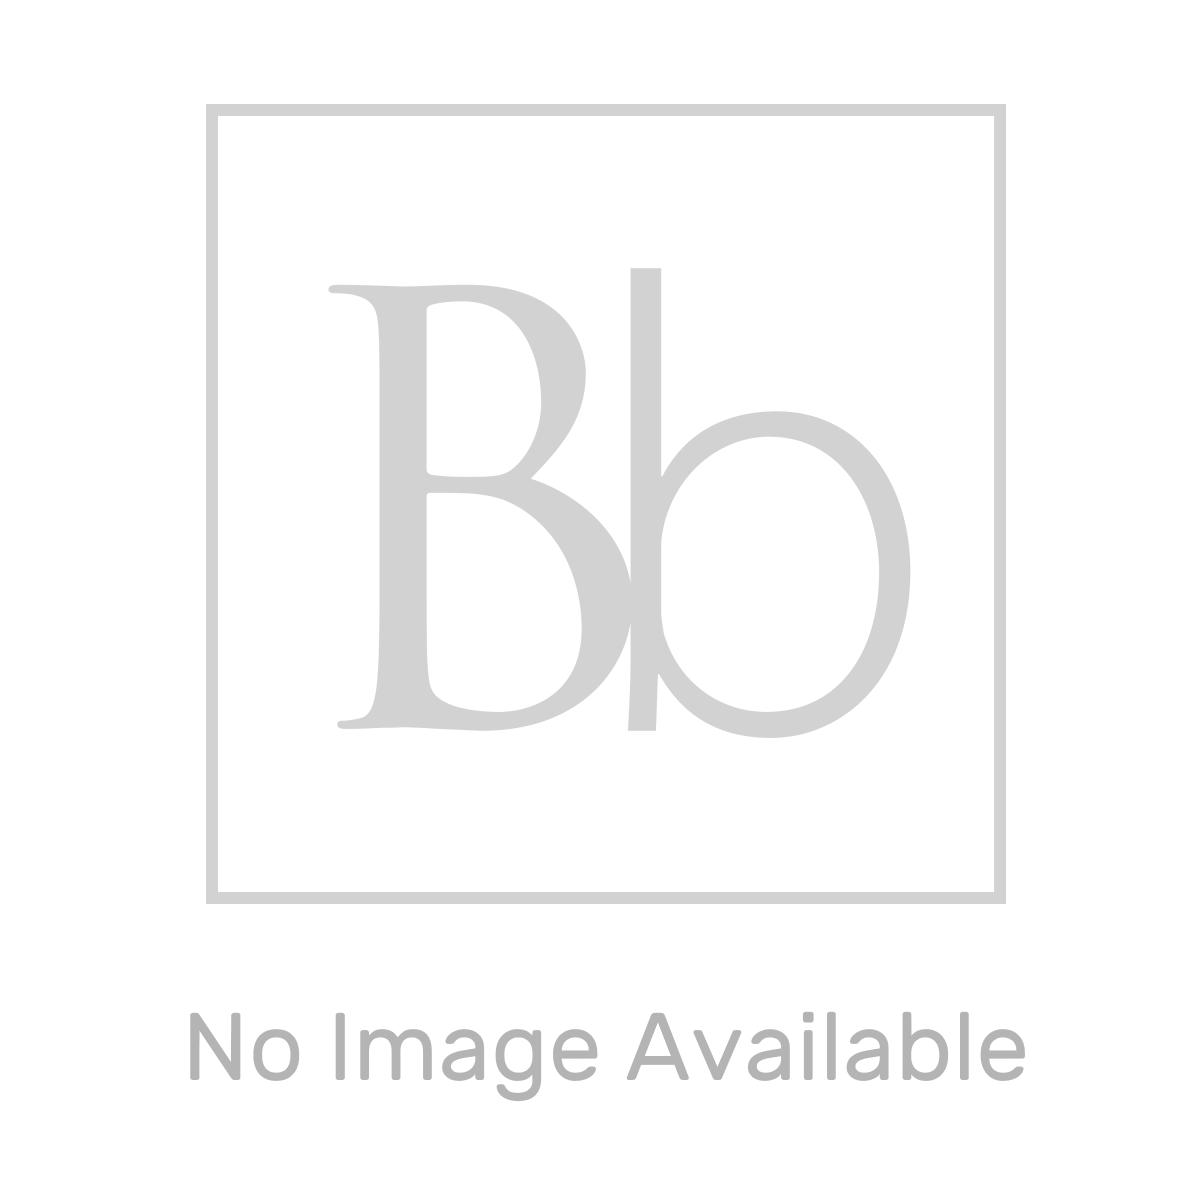 Aquadart White Slate Shower Tray 1100 x 900